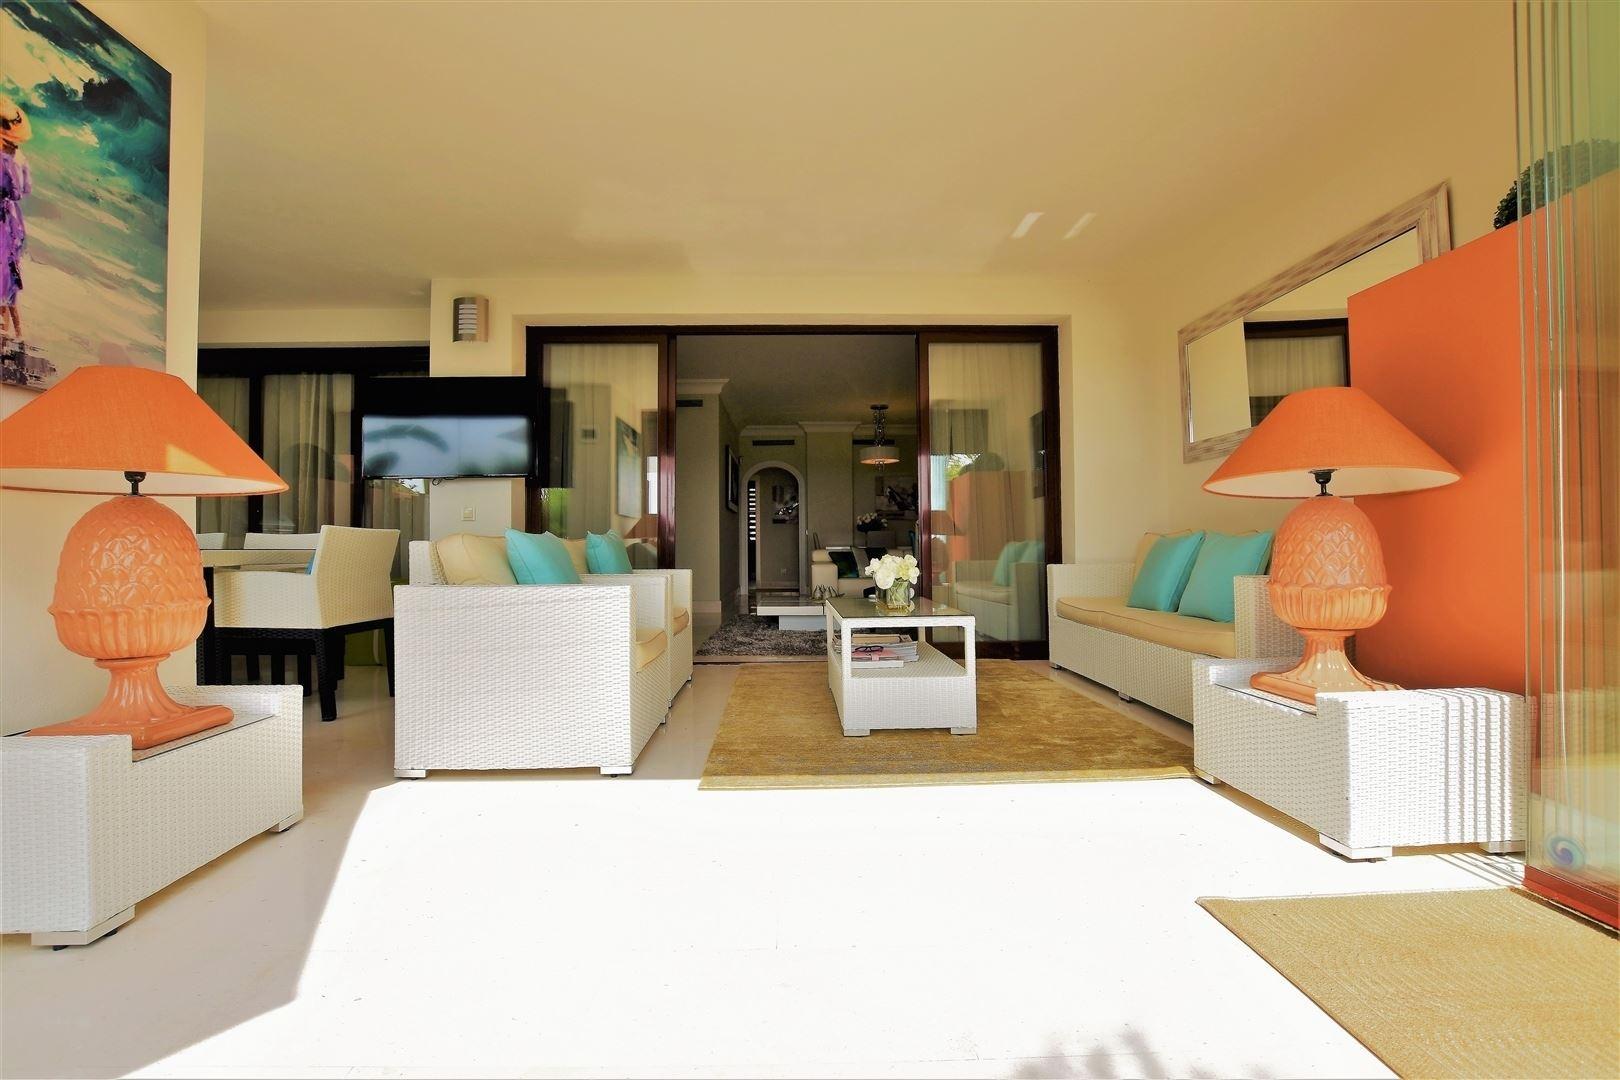 Foto 9 : Appartement te 29679 MARBELLA (Spanje) - Prijs € 1.750